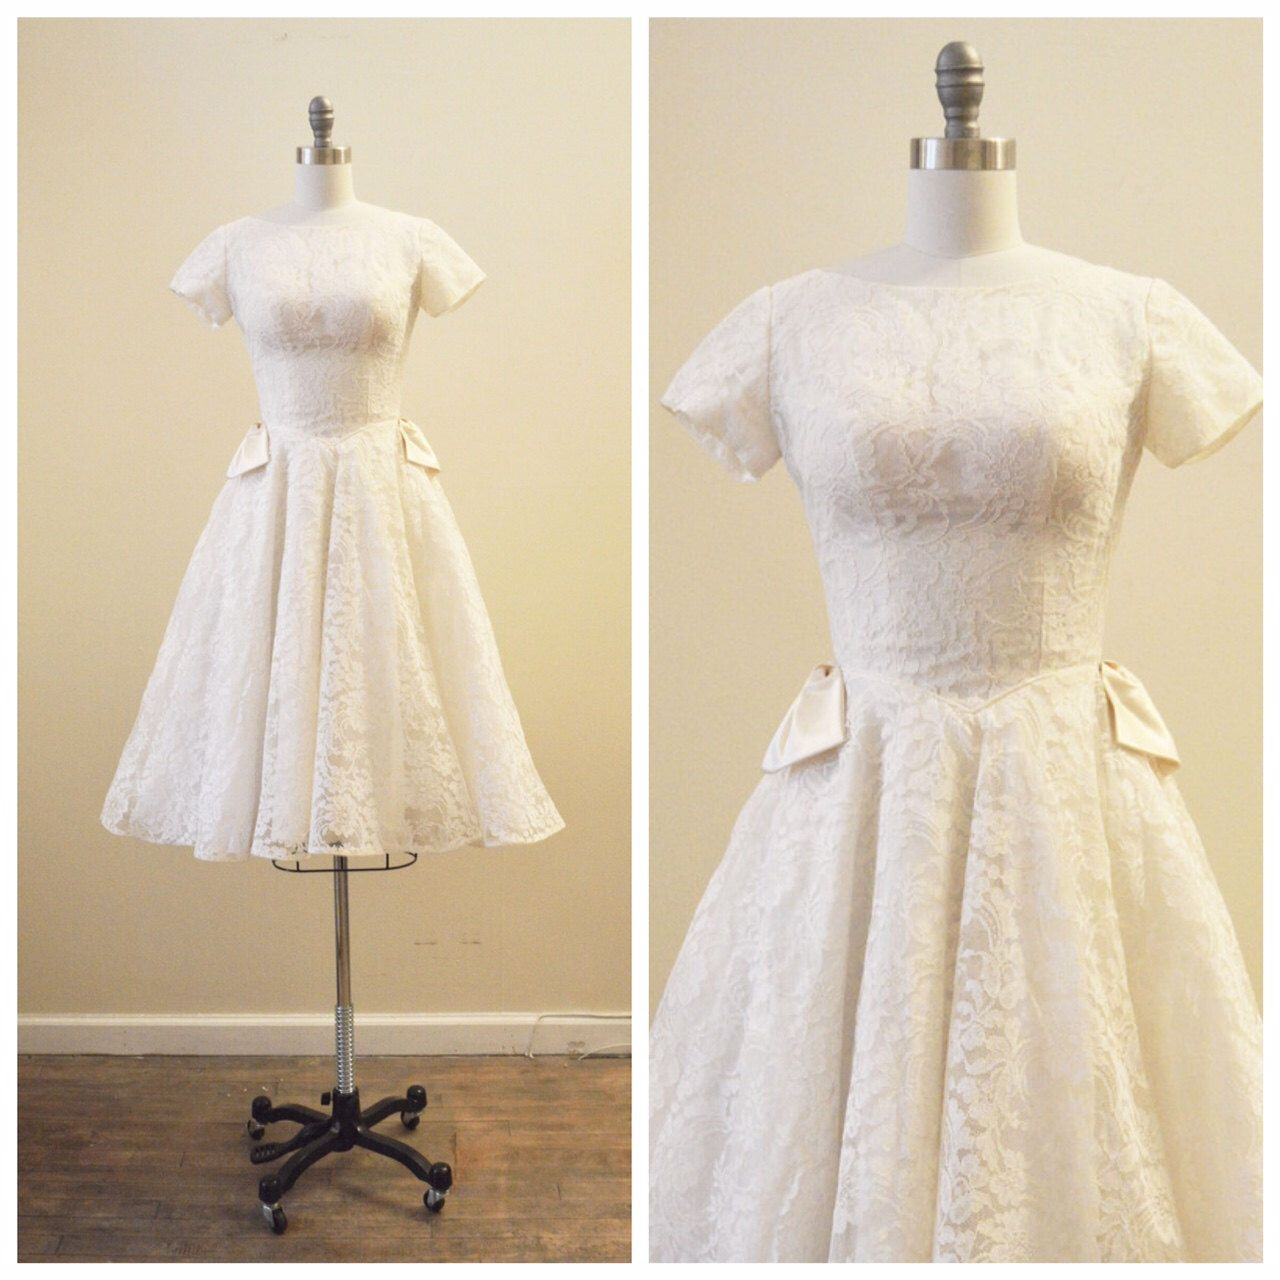 Vintage Bridal 1950's Ivory Chantilly Lace tea length wedding dress by MirandasBridal on Etsy https://www.etsy.com/listing/228411137/vintage-bridal-1950s-ivory-chantilly